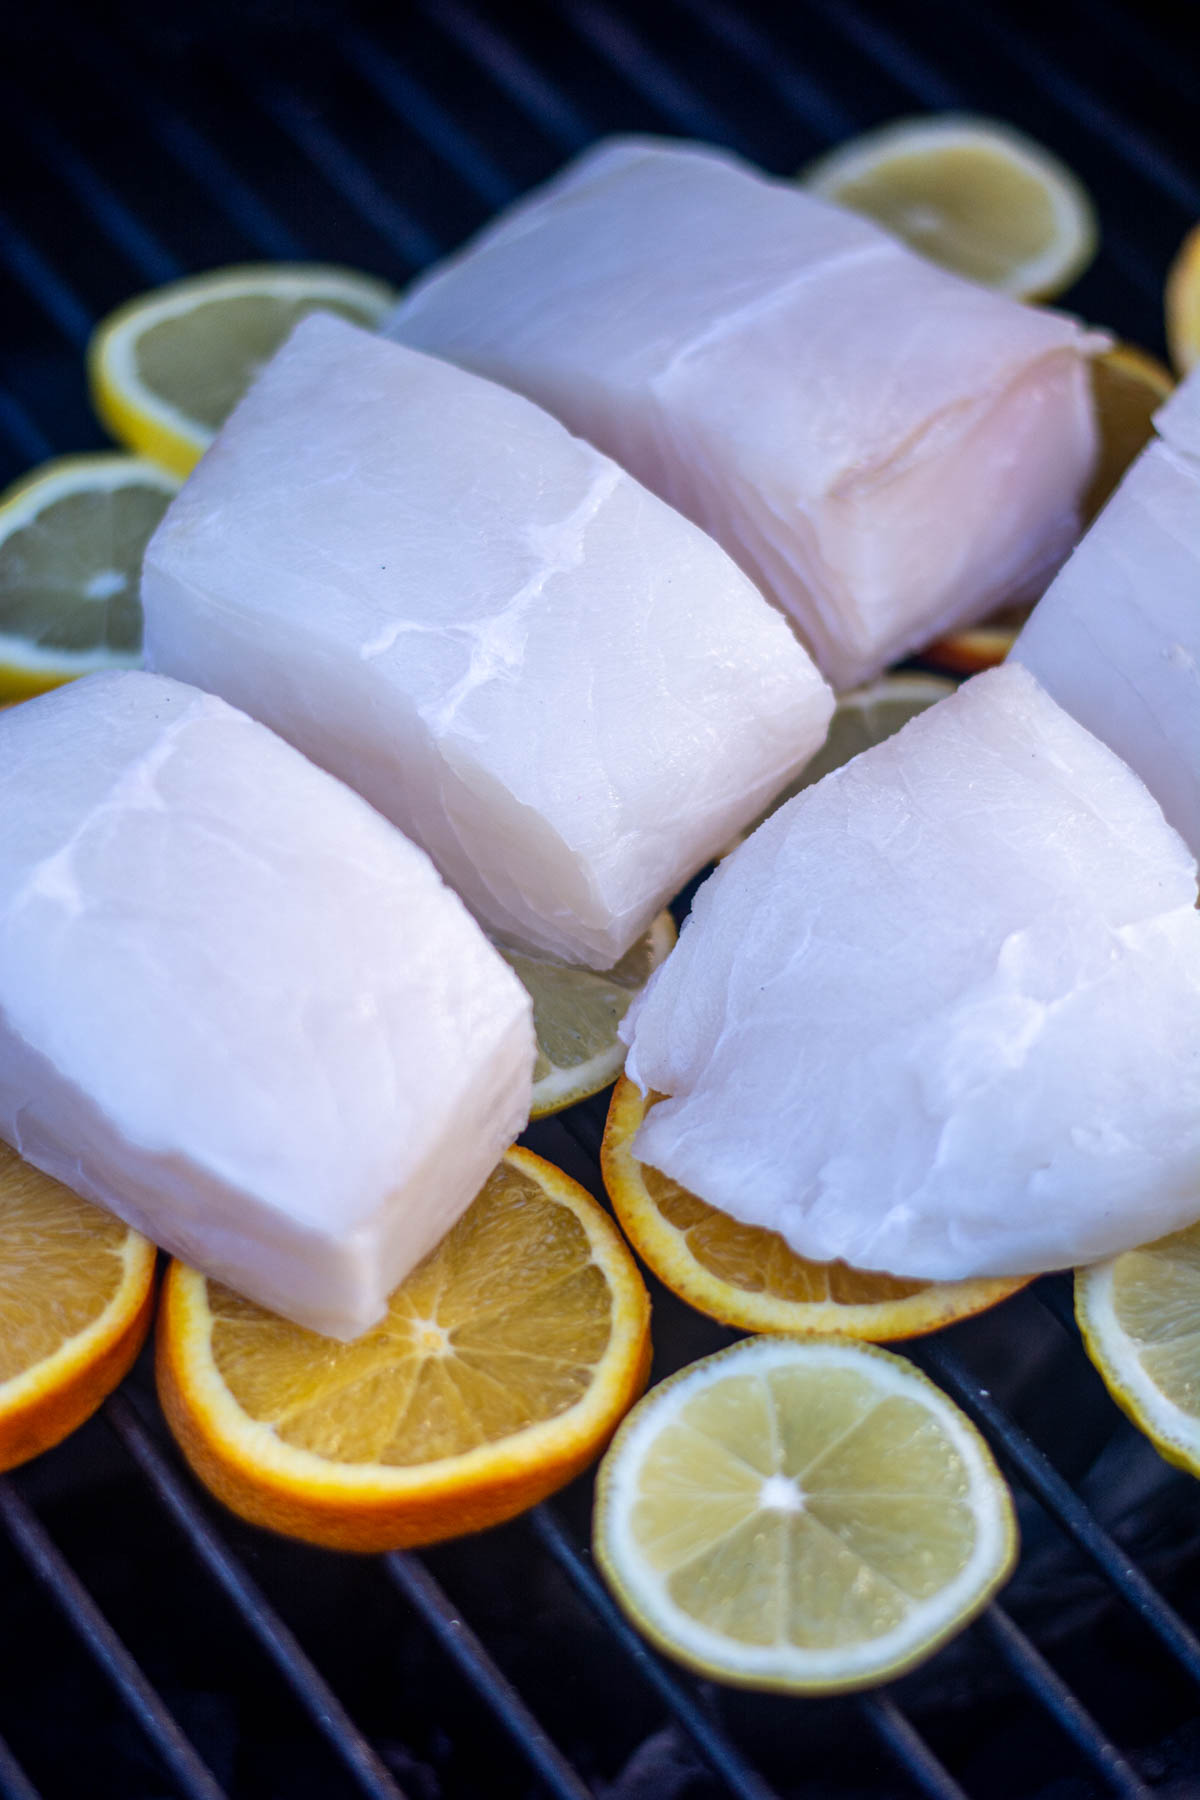 halibut on a bed of lemons and oranges.